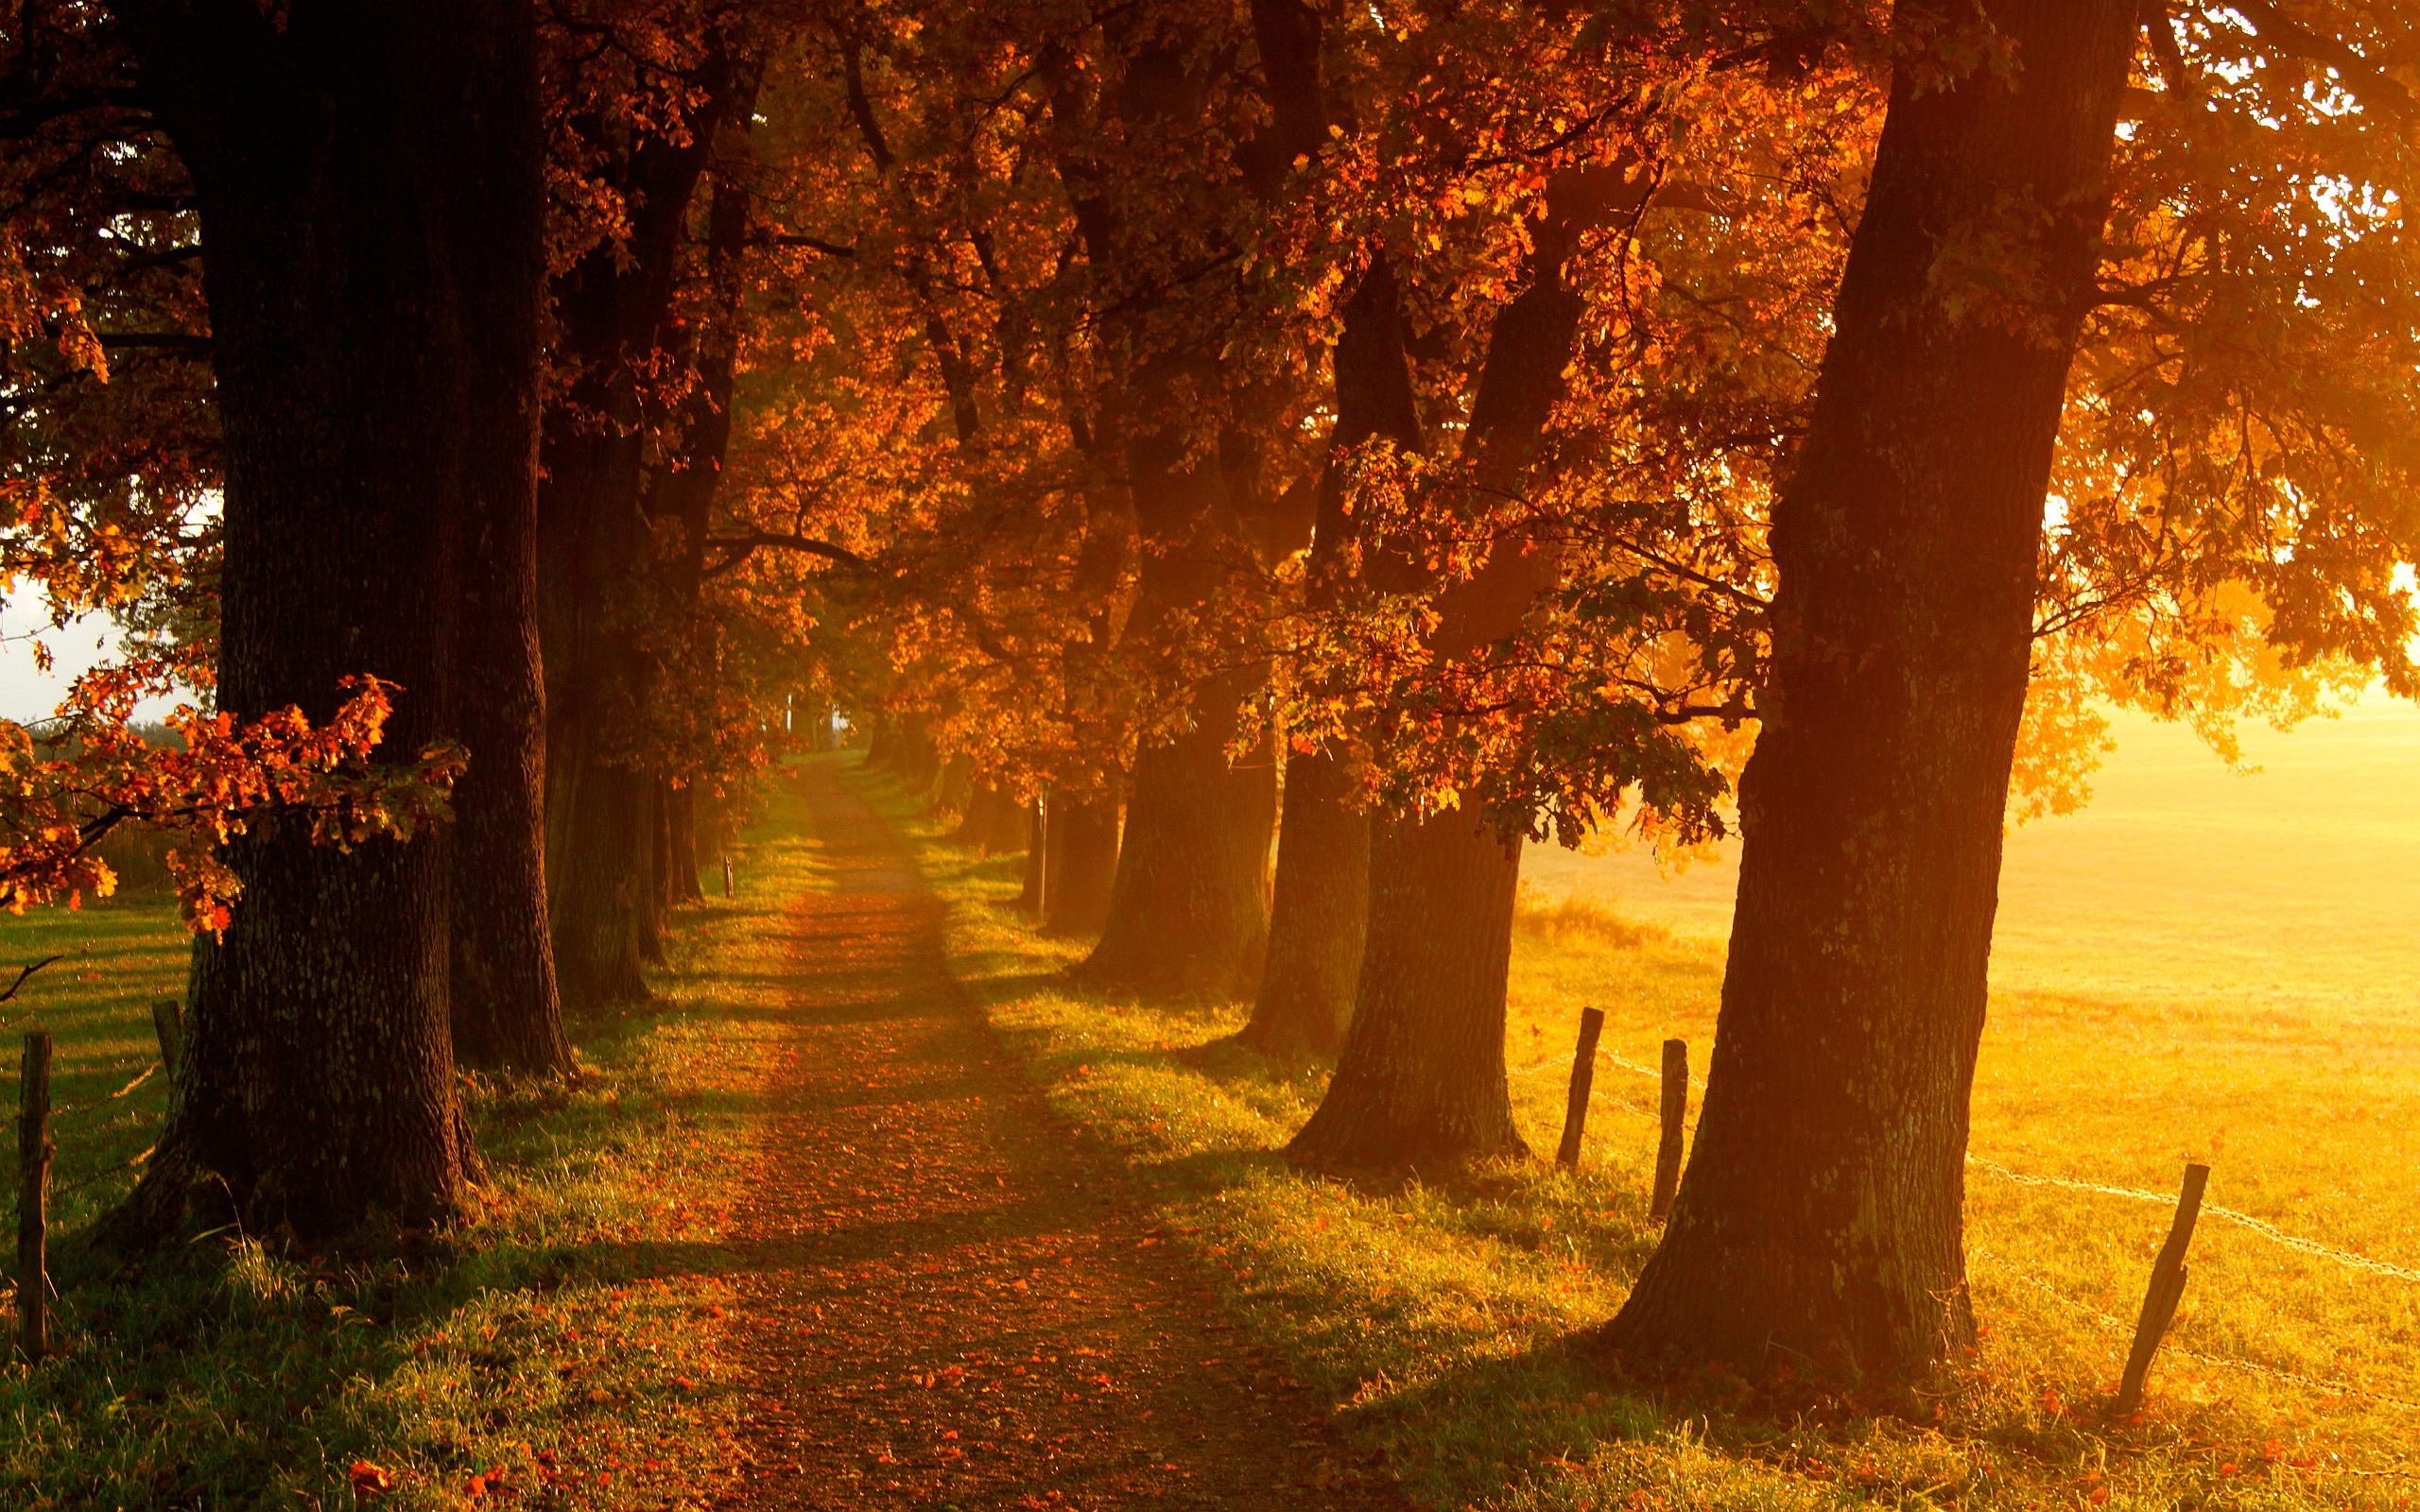 Beautiful Fall Scenery Wallpaper - WallpaperSafari